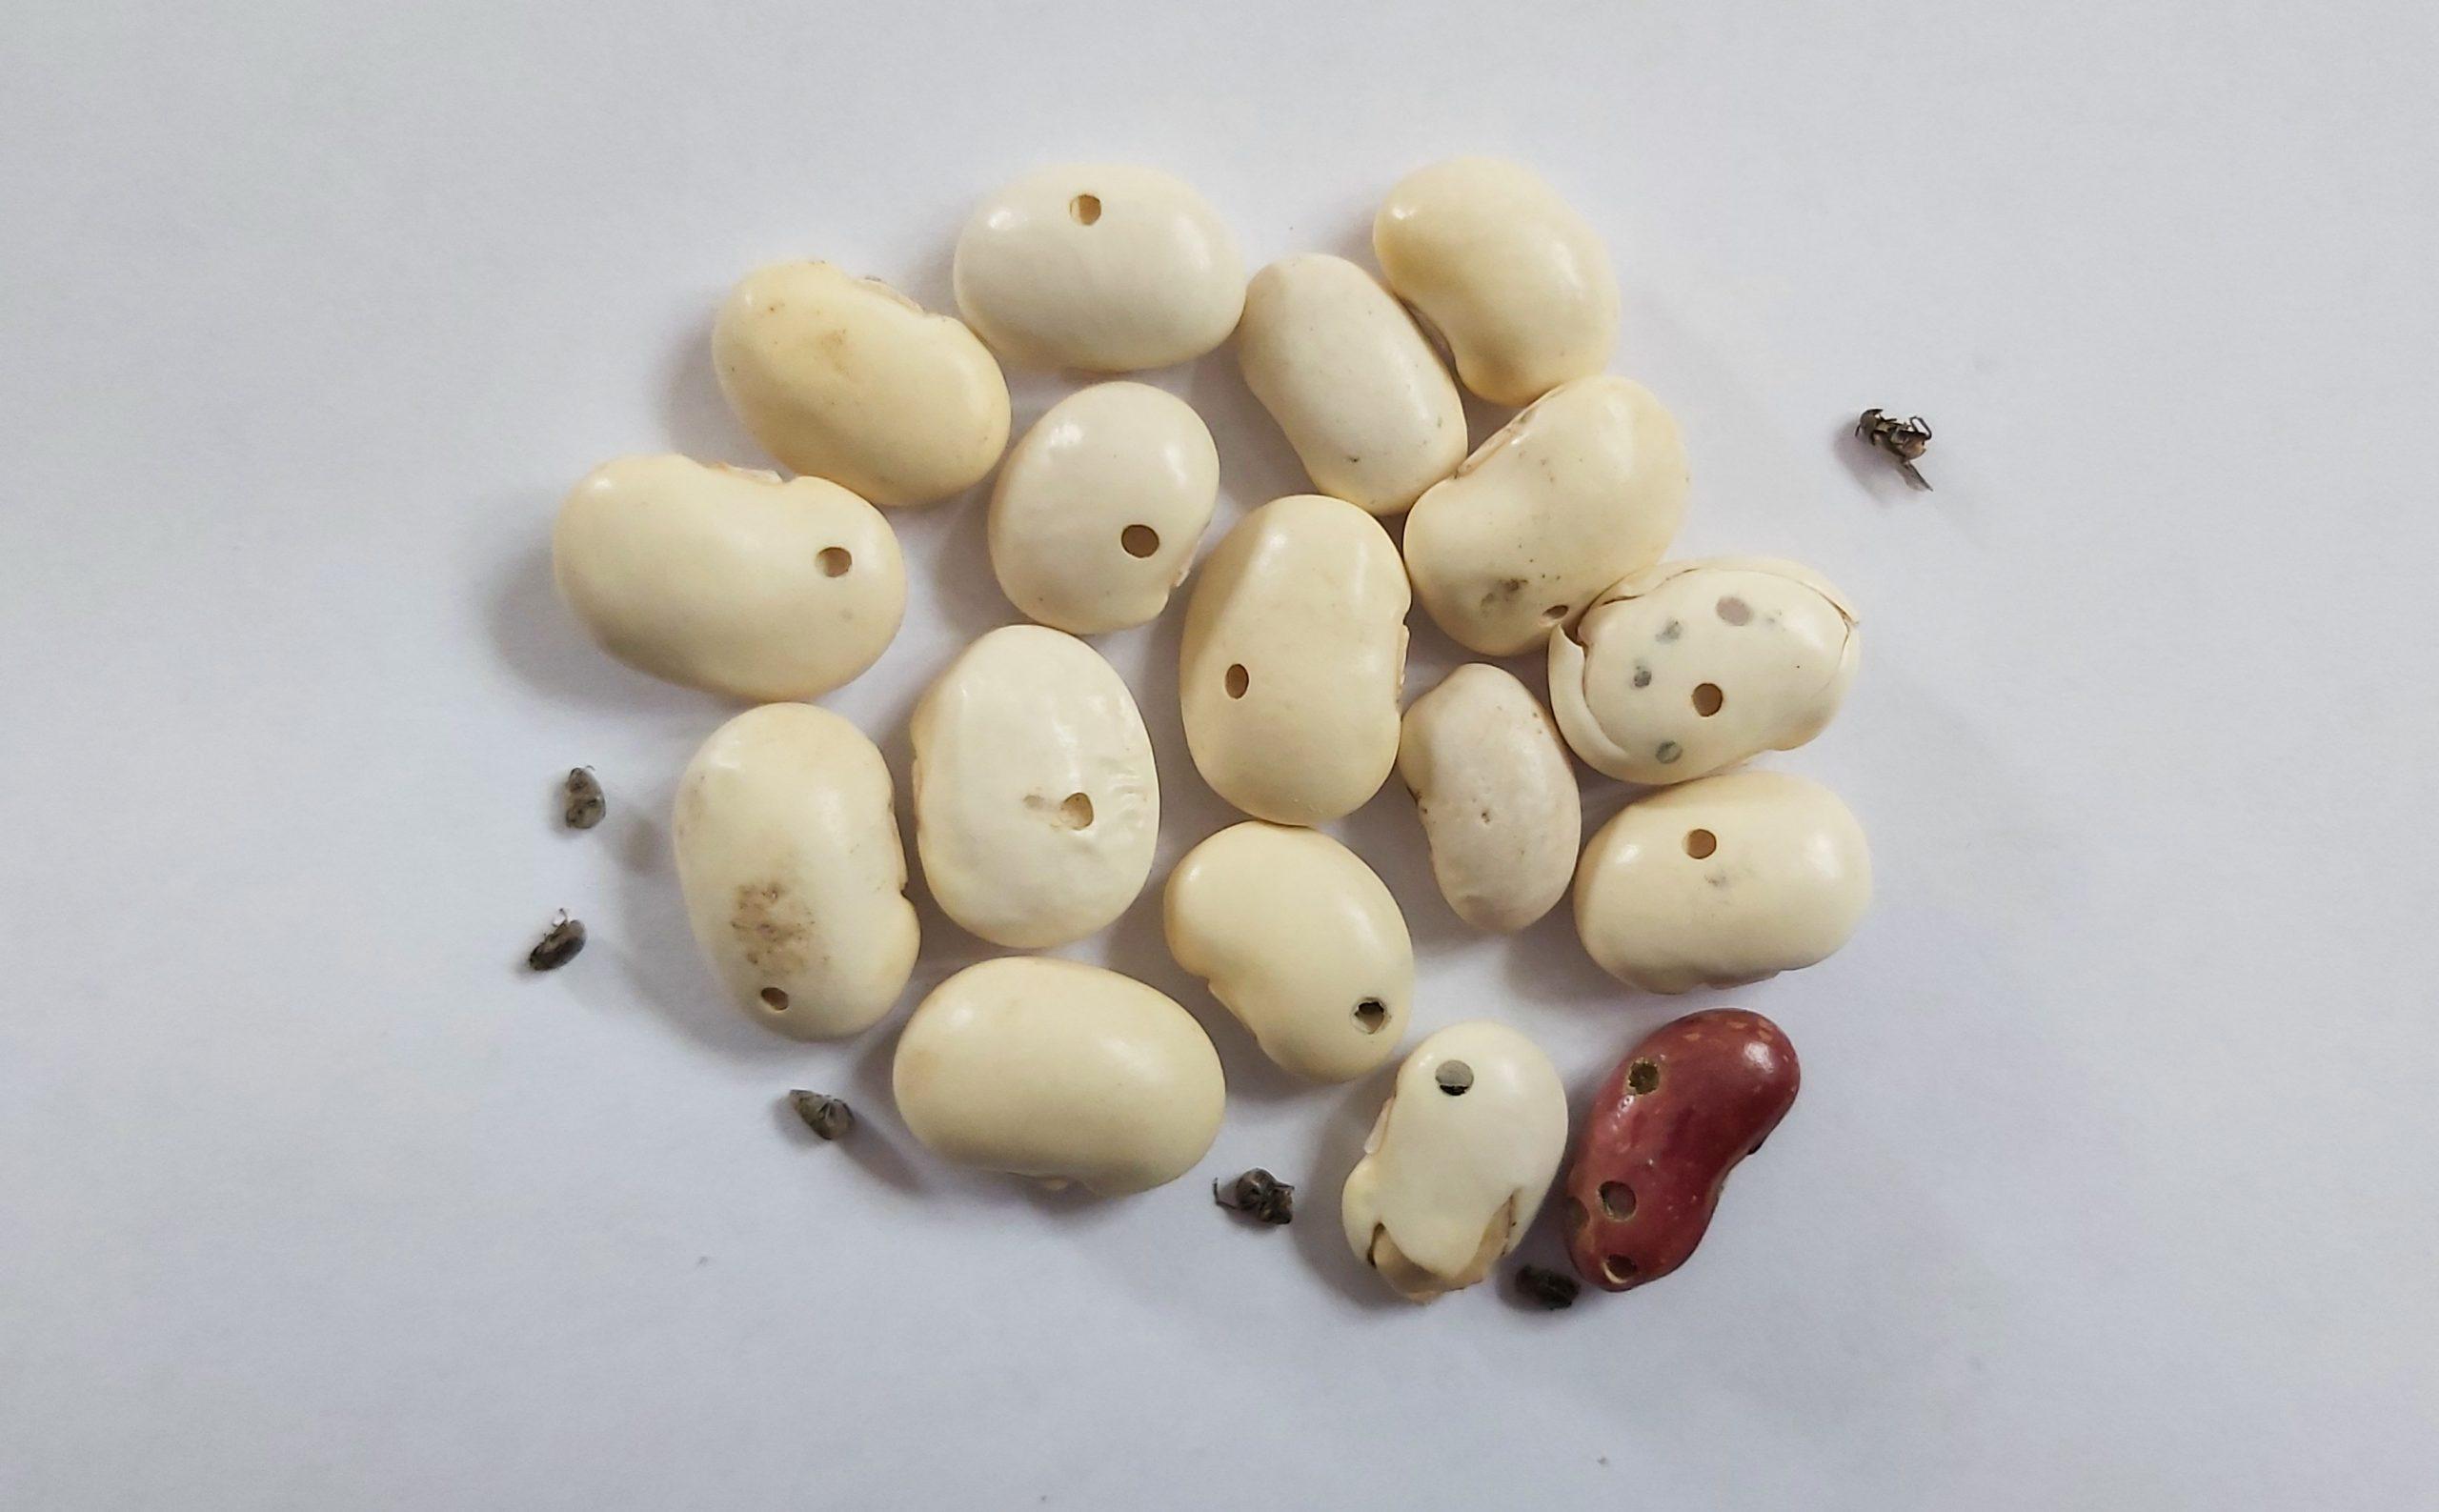 Dārza Pupiņu sēklgrauzis – Acanthoscelides obtectus